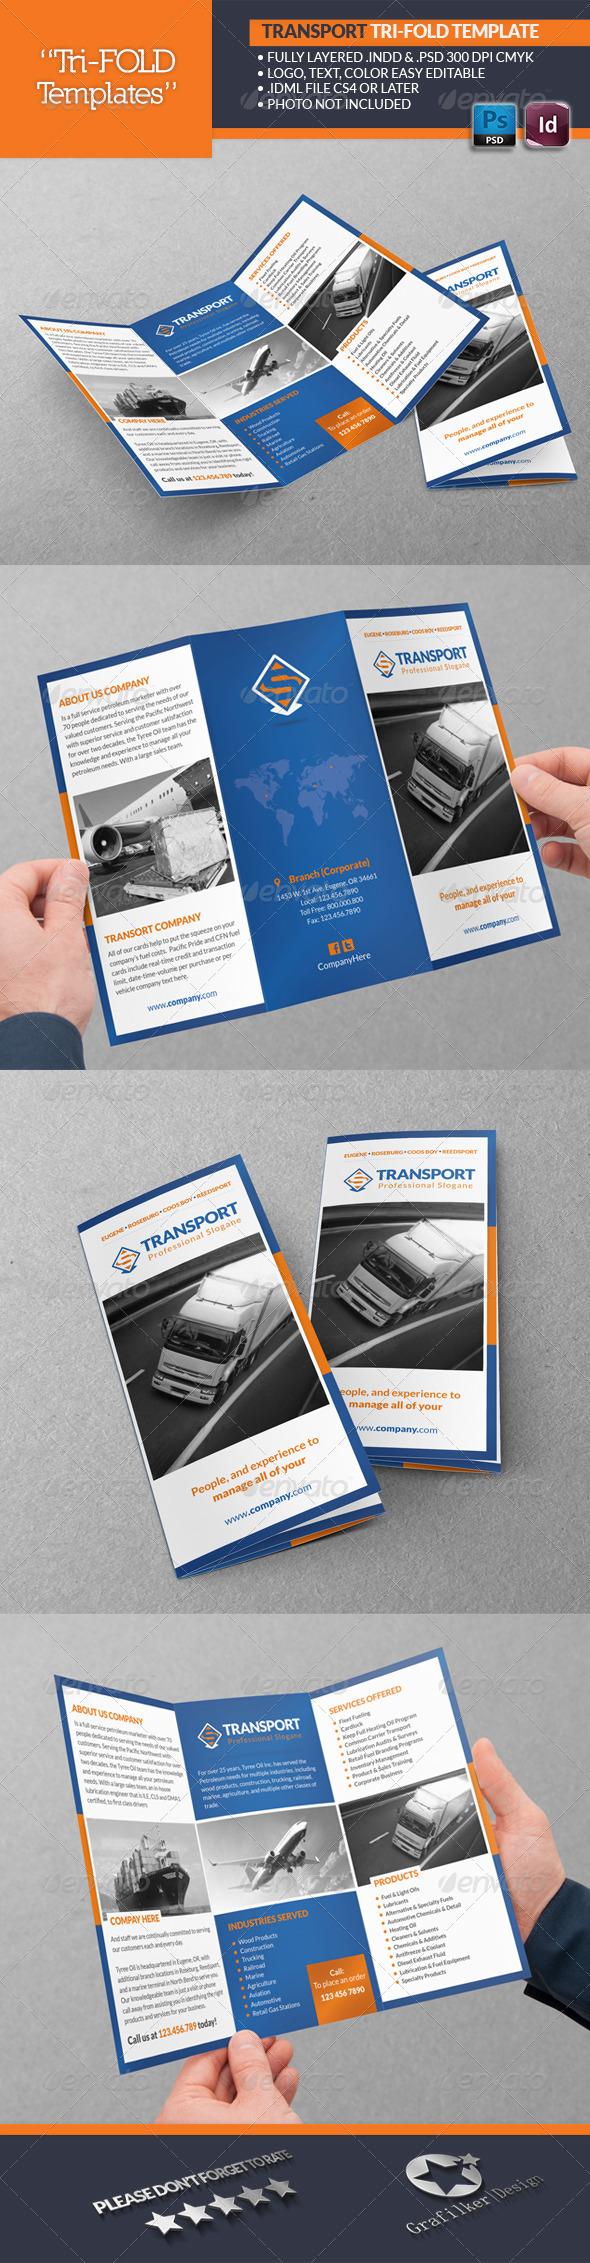 Transport Tri-Fold Templates - Brochures Print Templates